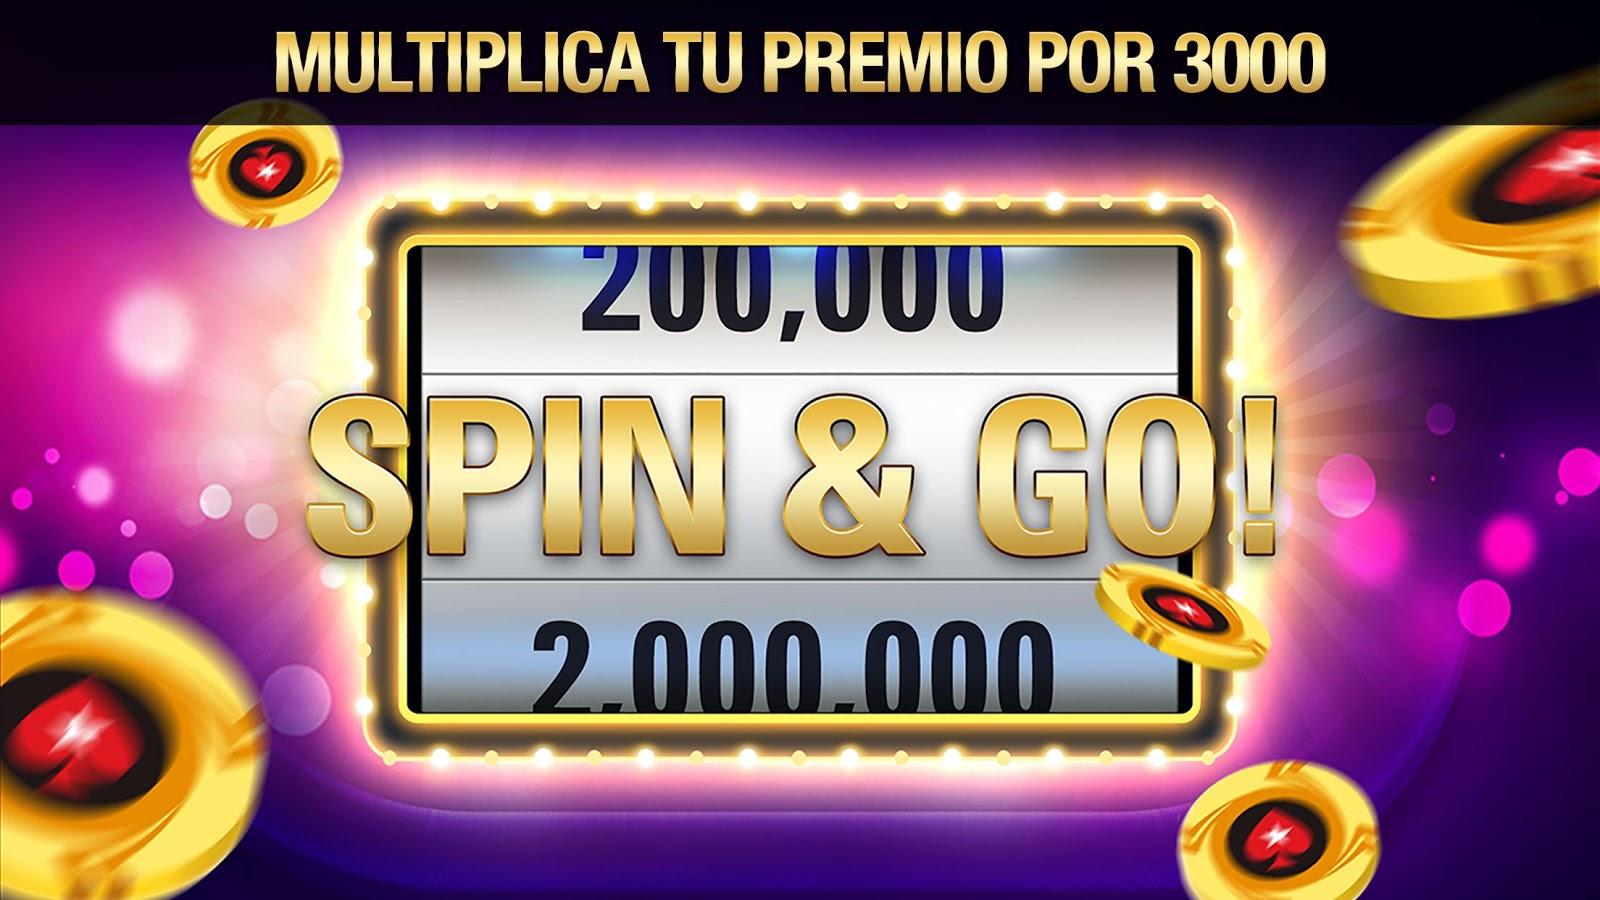 Giros gratis pokerstars torneos celebrados casino-162772